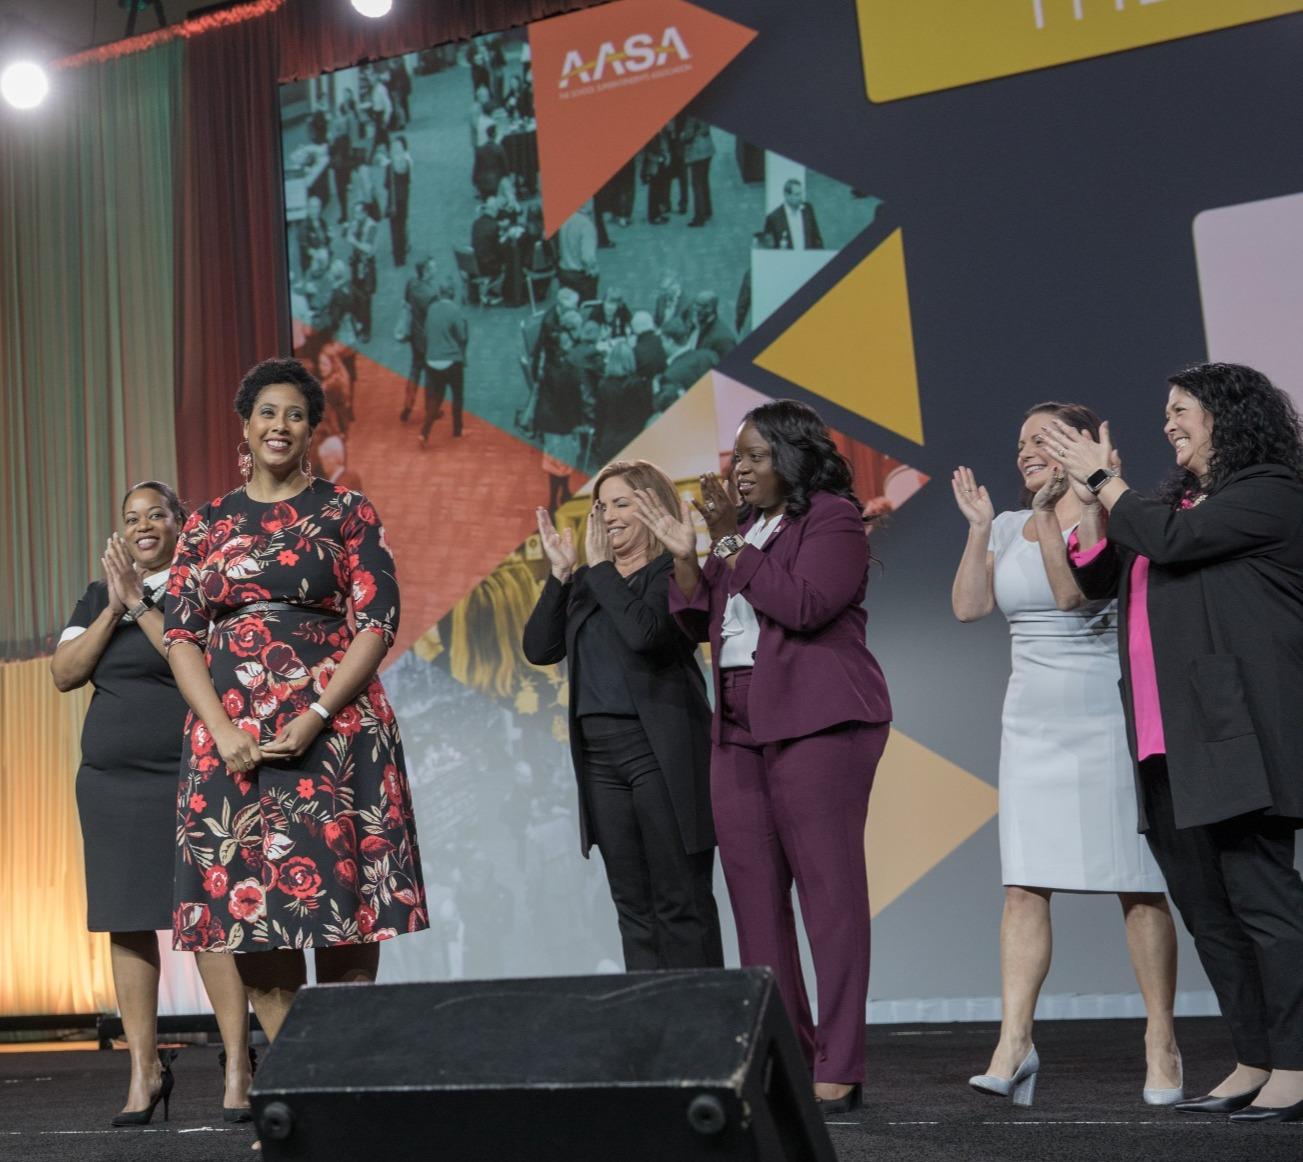 Lesley Bruinton, 2020 Women in School Leadership Award Winner